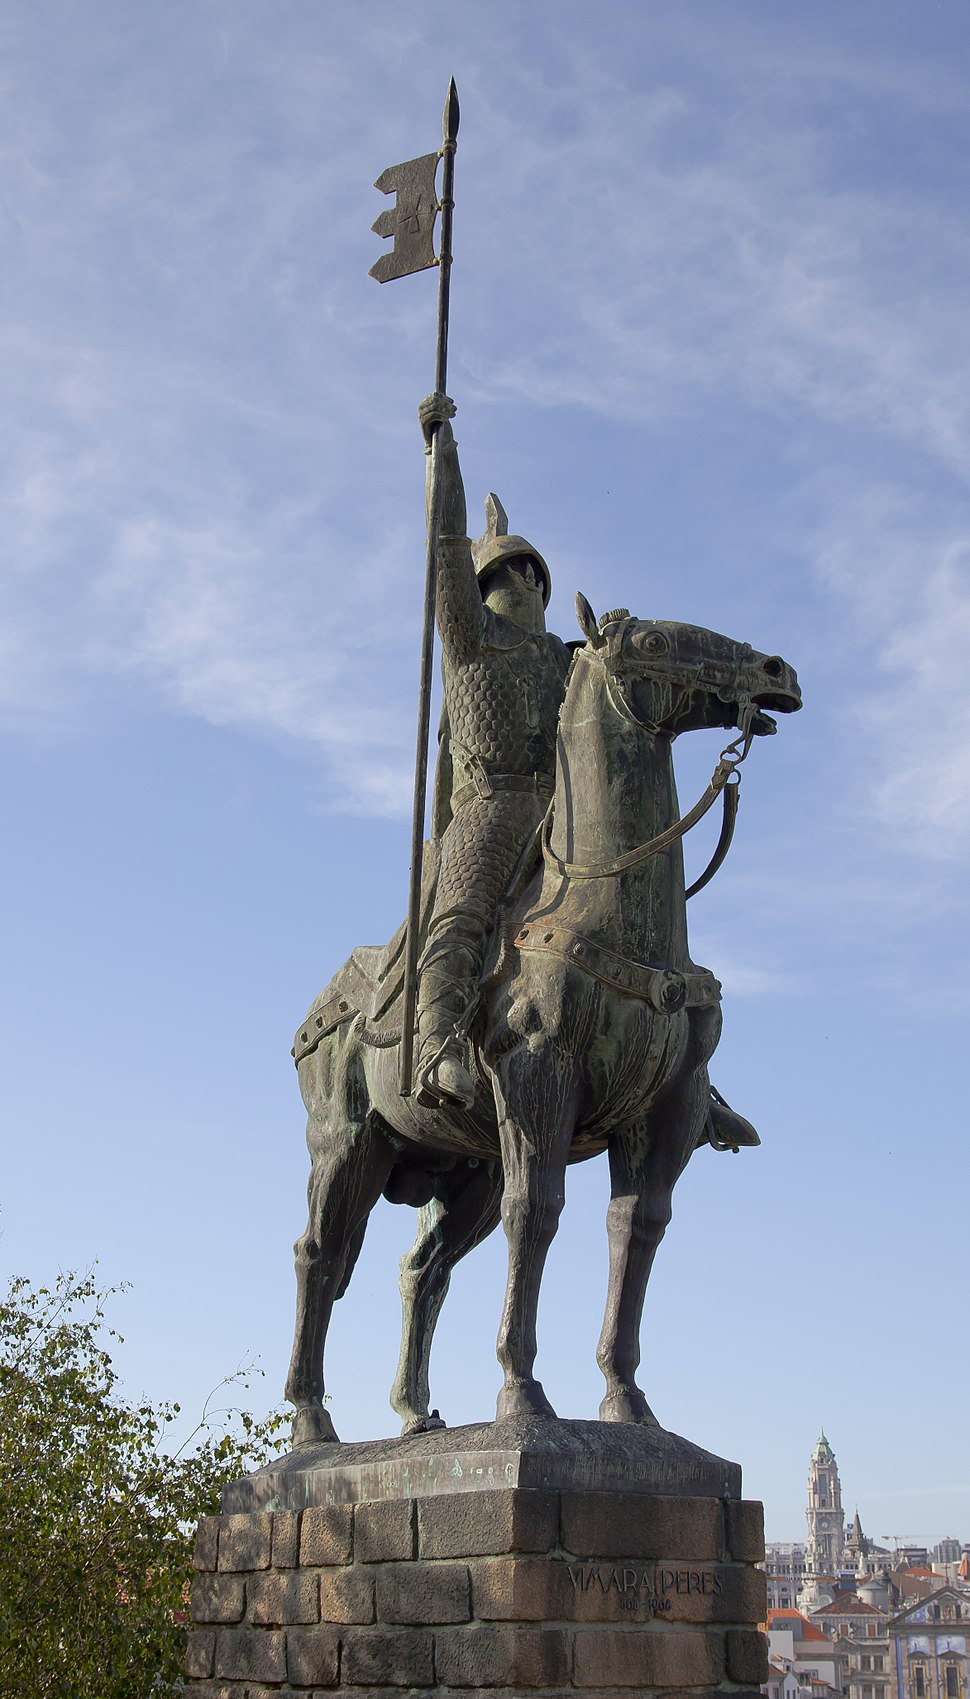 Estatua de Vimara Peres, Oporto, Portugal, 2012-05-09, DD 02